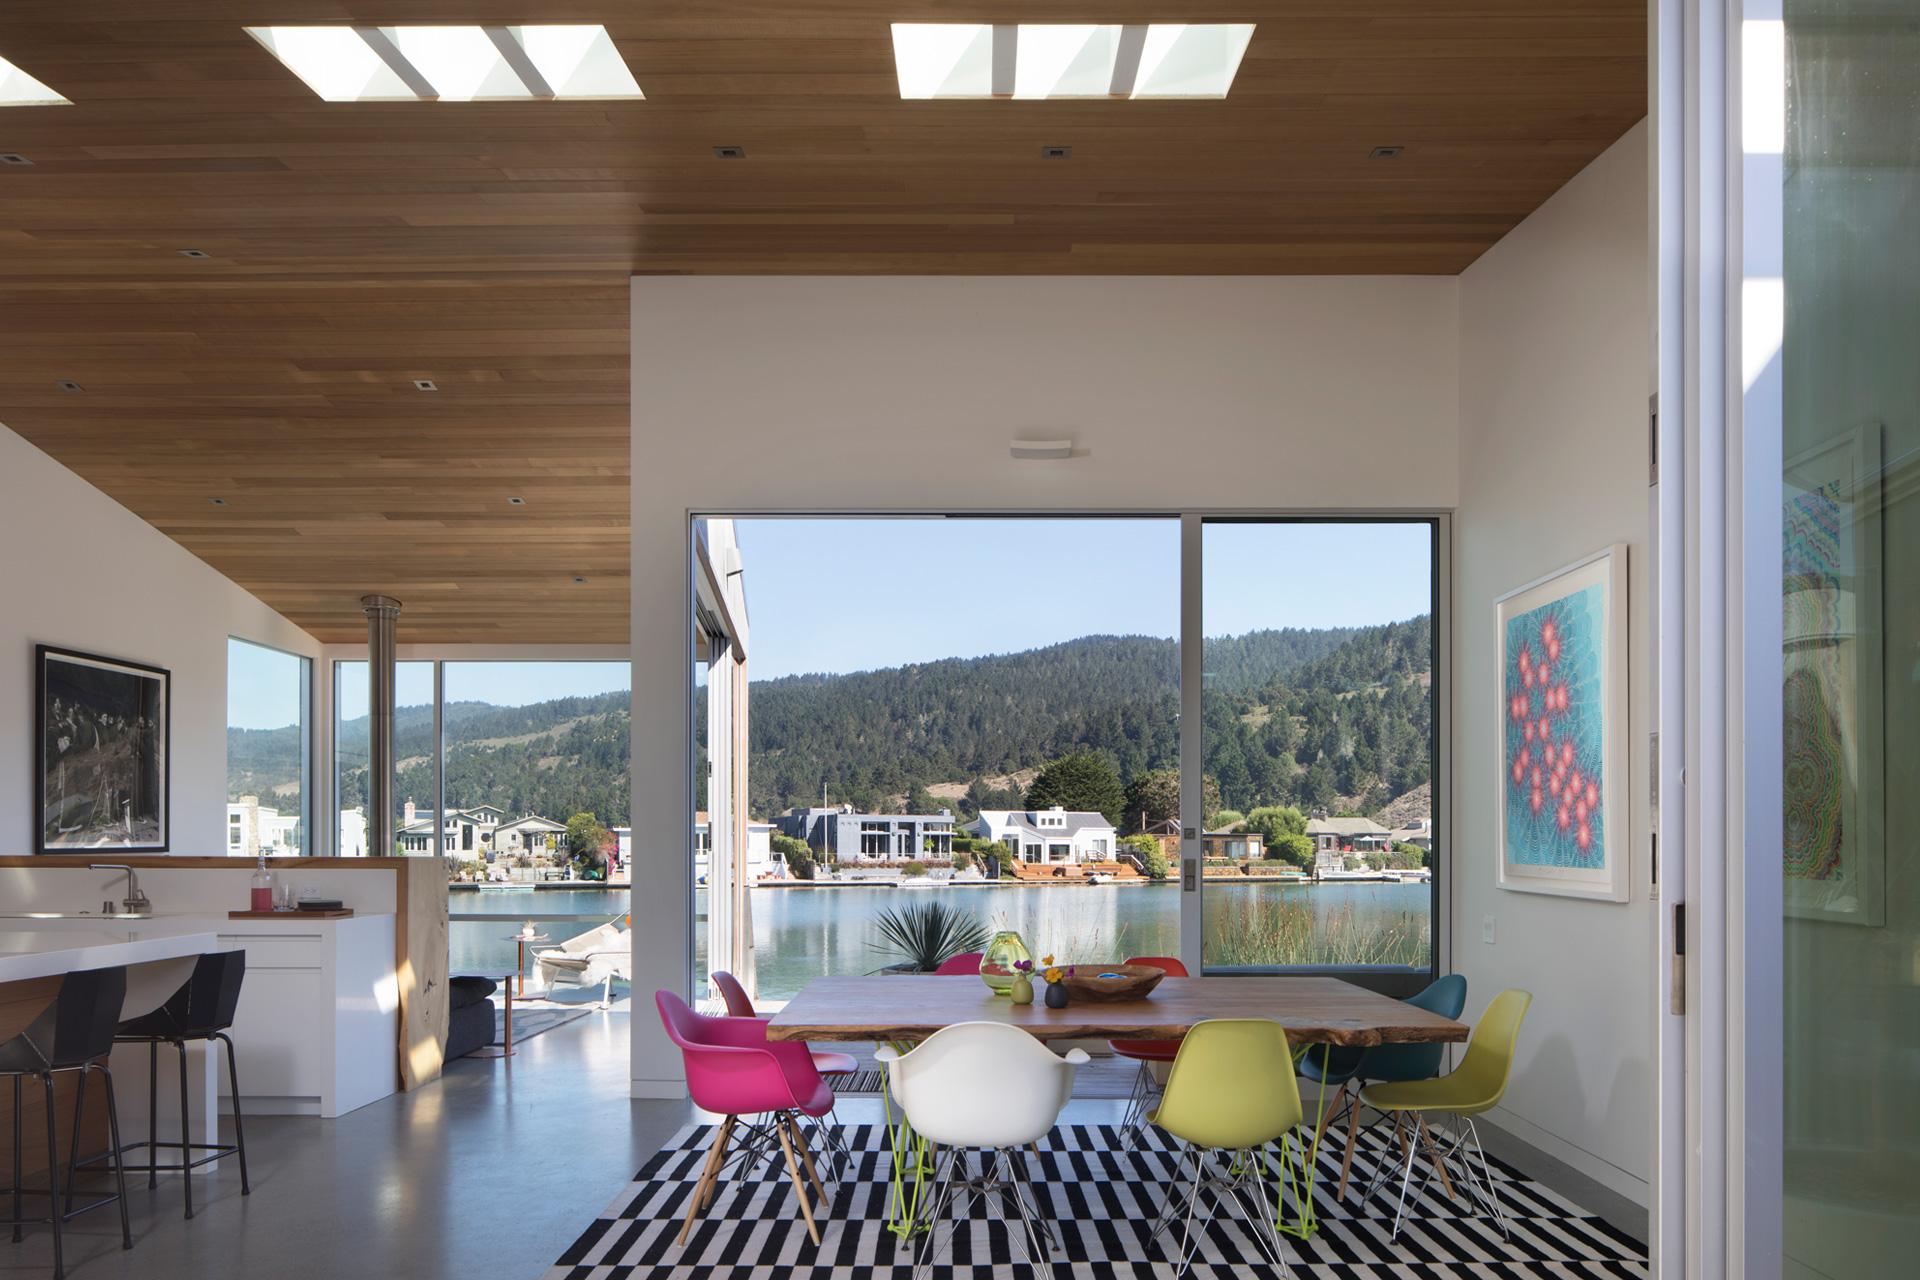 Lagoon House modern home design